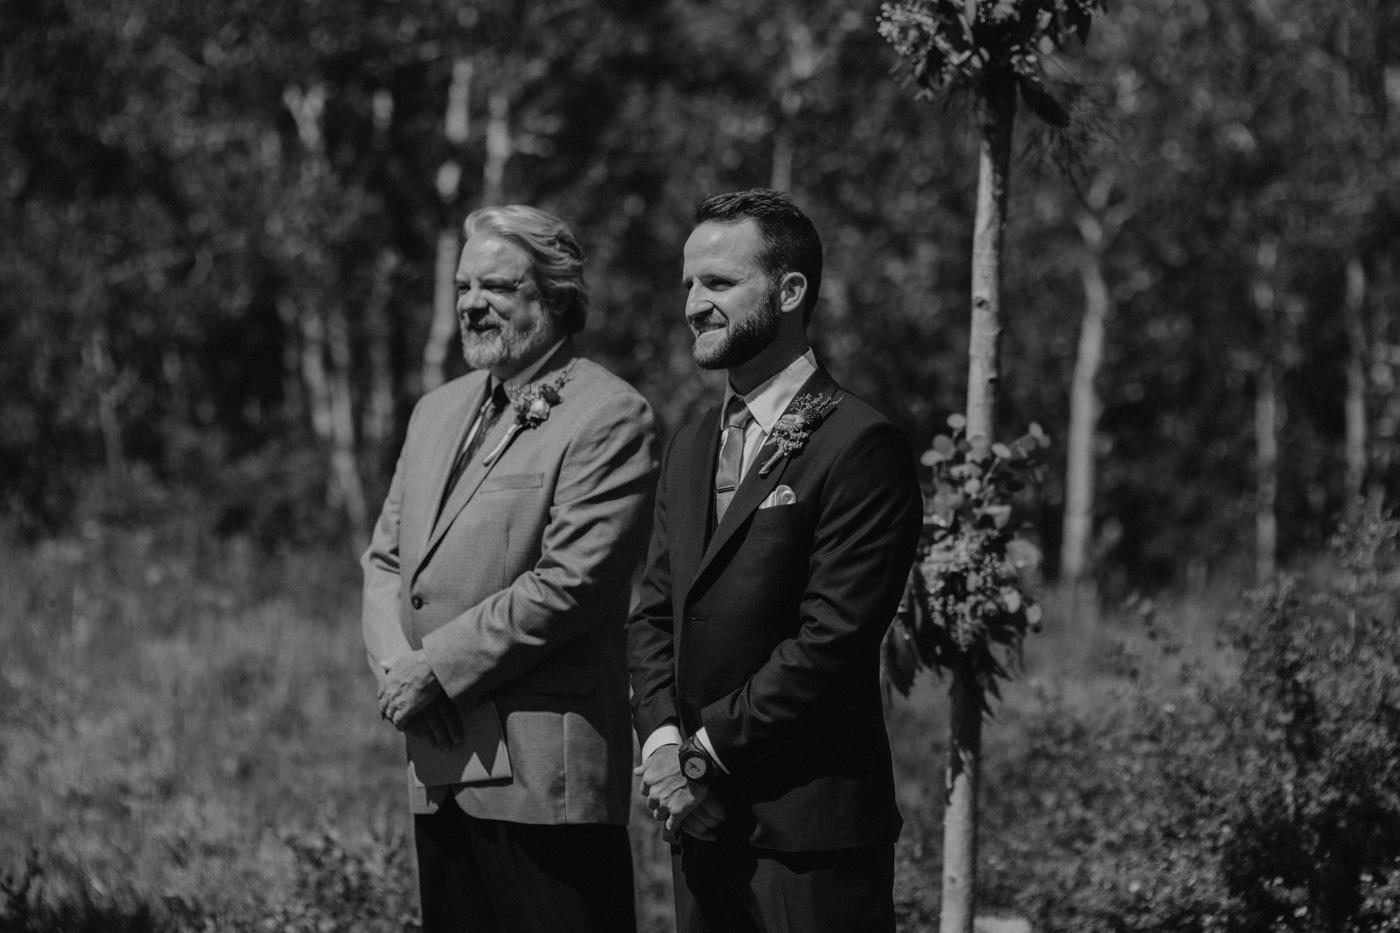 woods-walk-trail-crested-butte-colorado-wedding-34.jpg